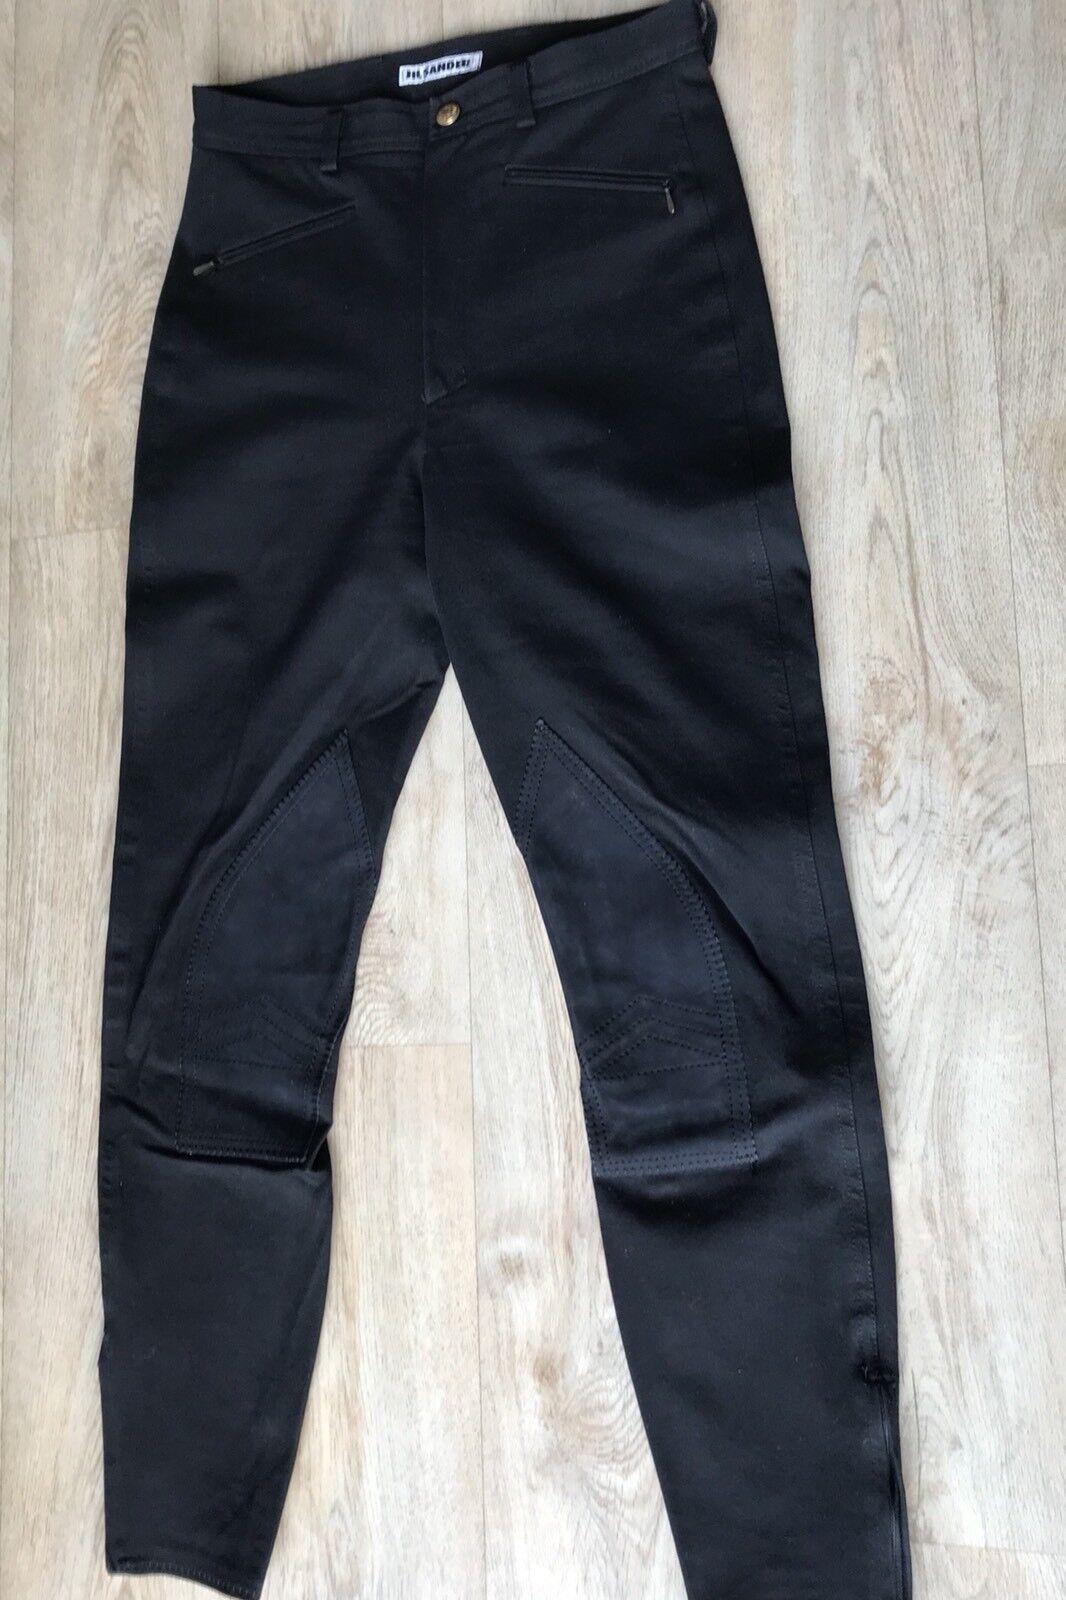 JIL Sander   -   Reiterhose  -  black  -  Größe 38